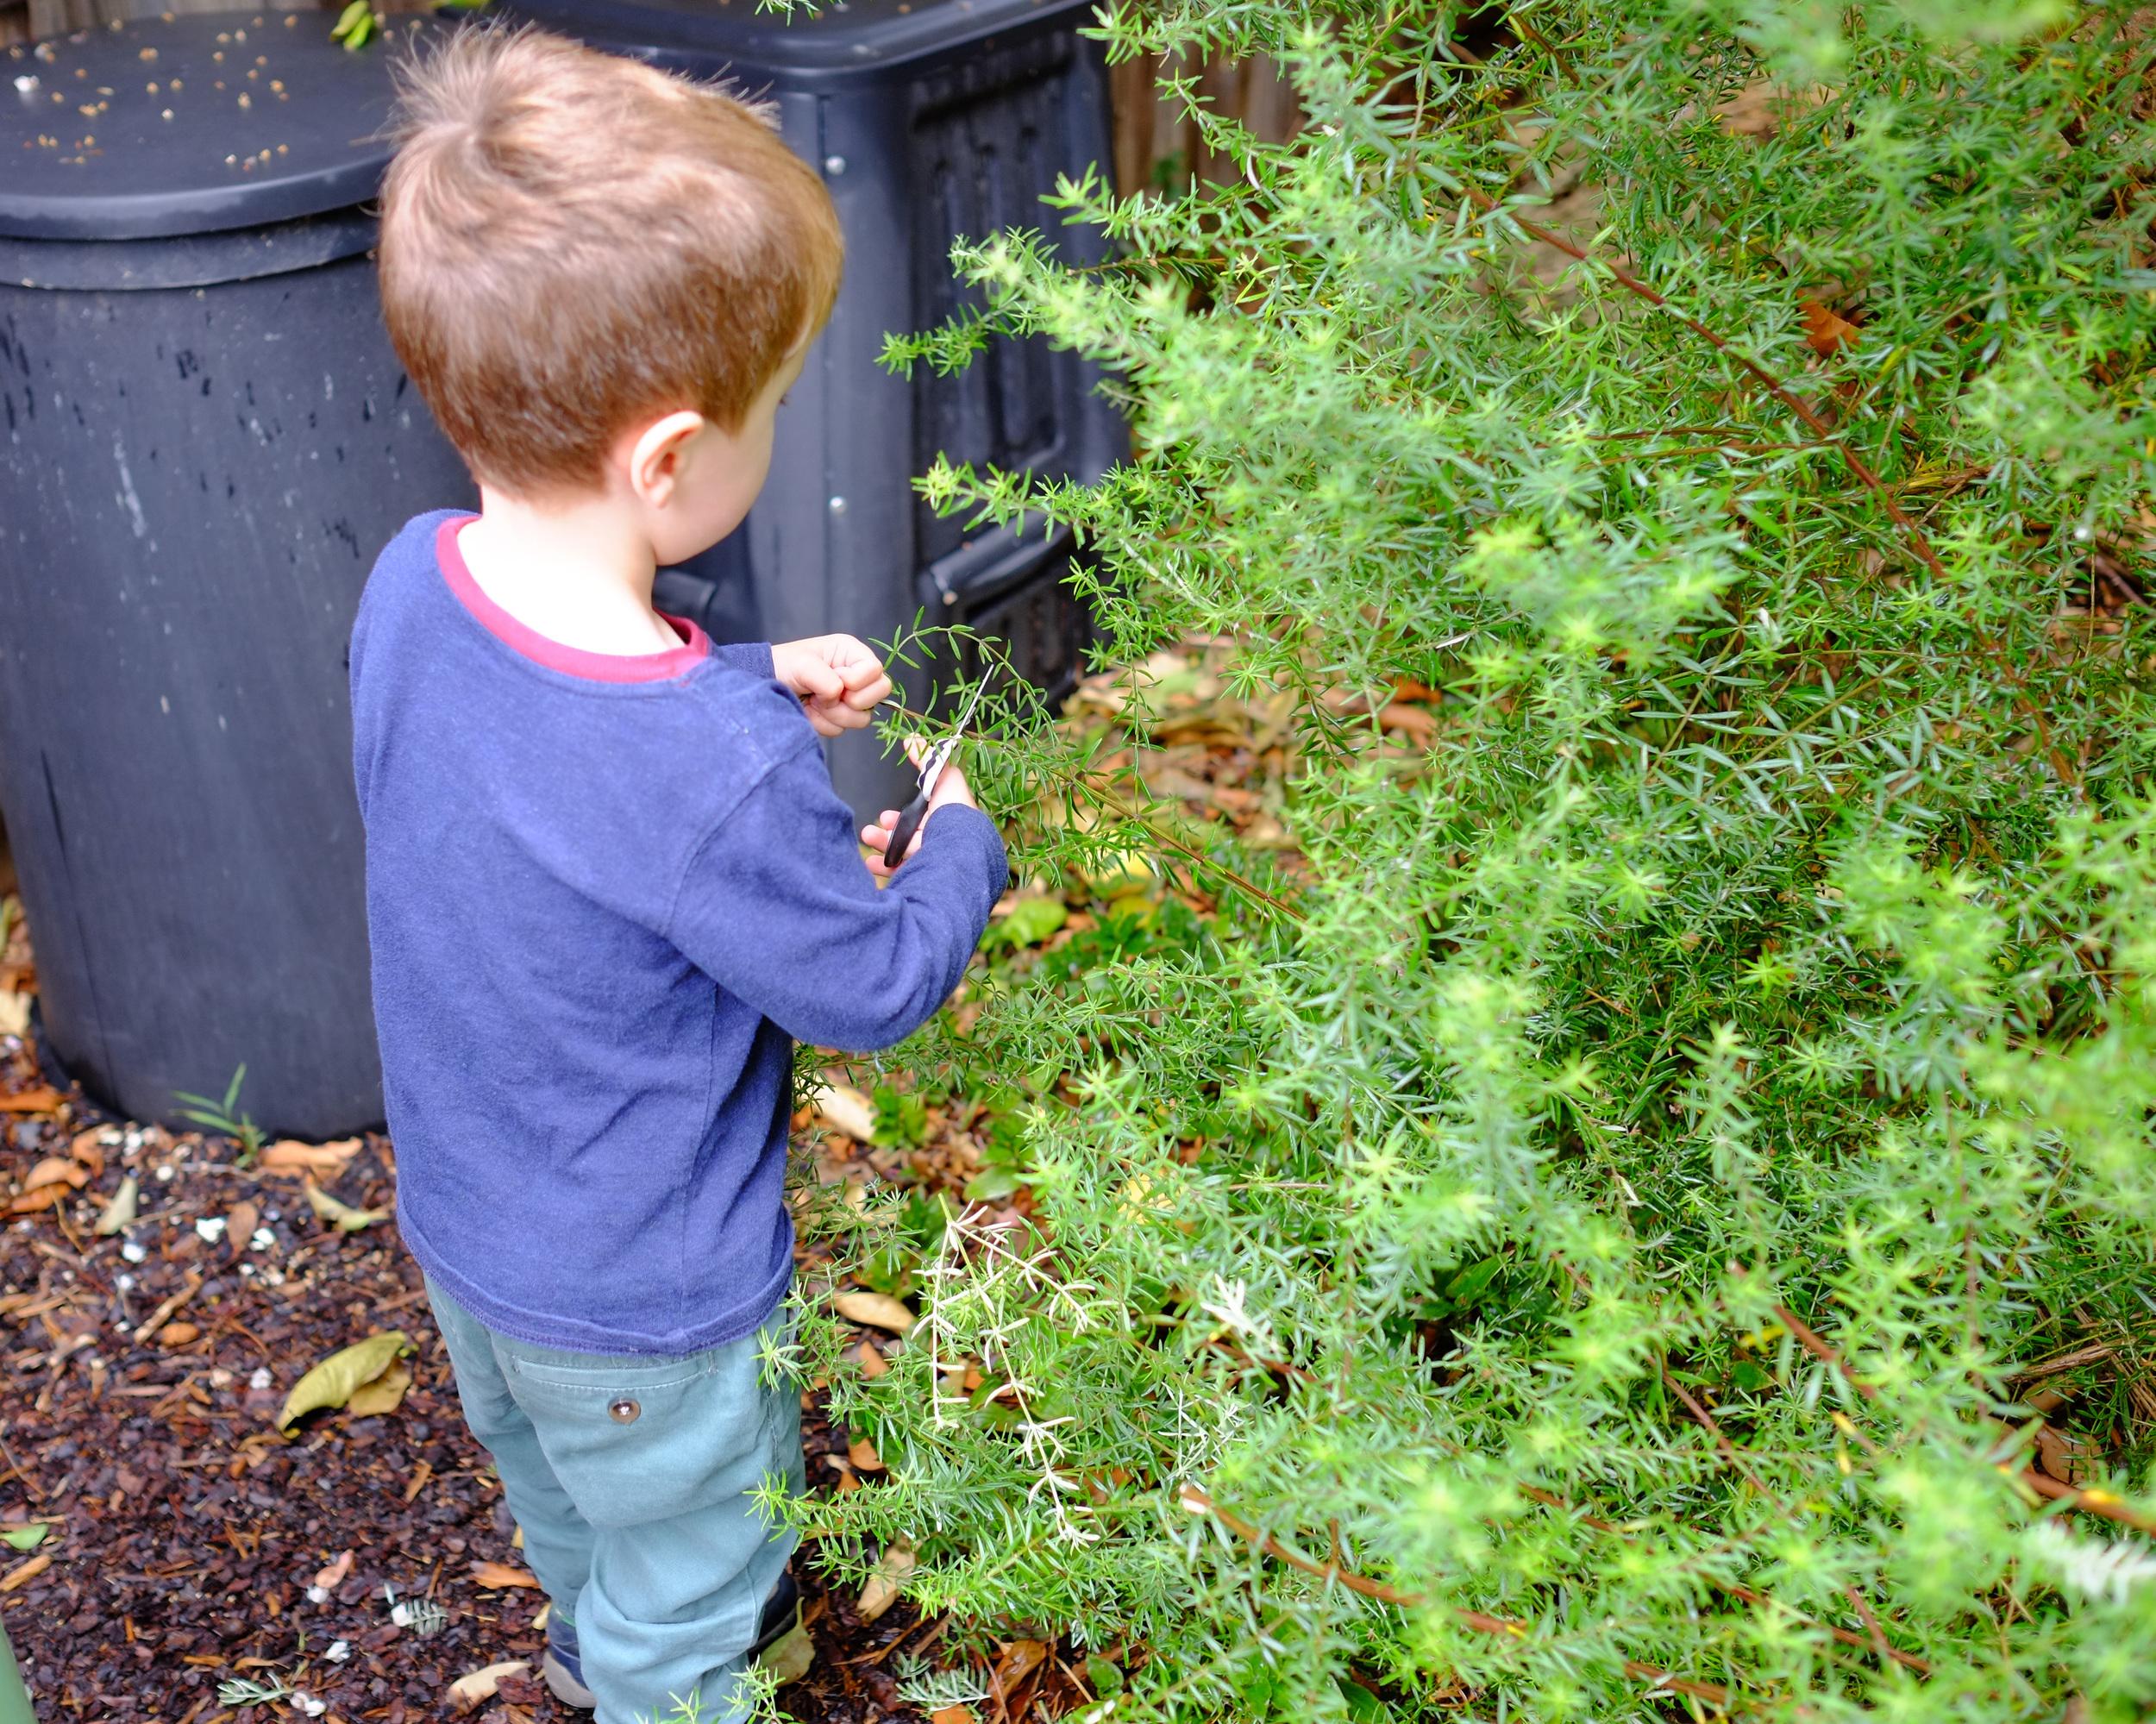 snipping garden plants